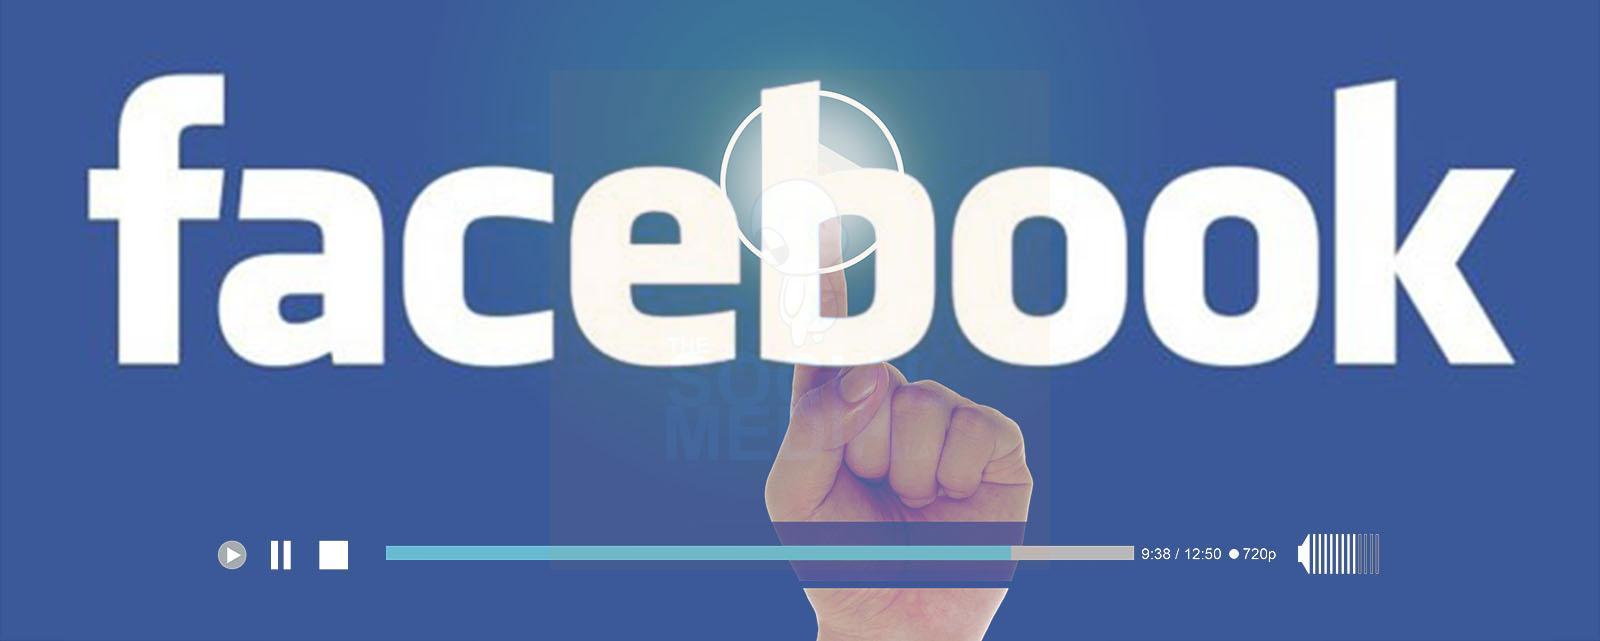 videos en facebook mundogamusino